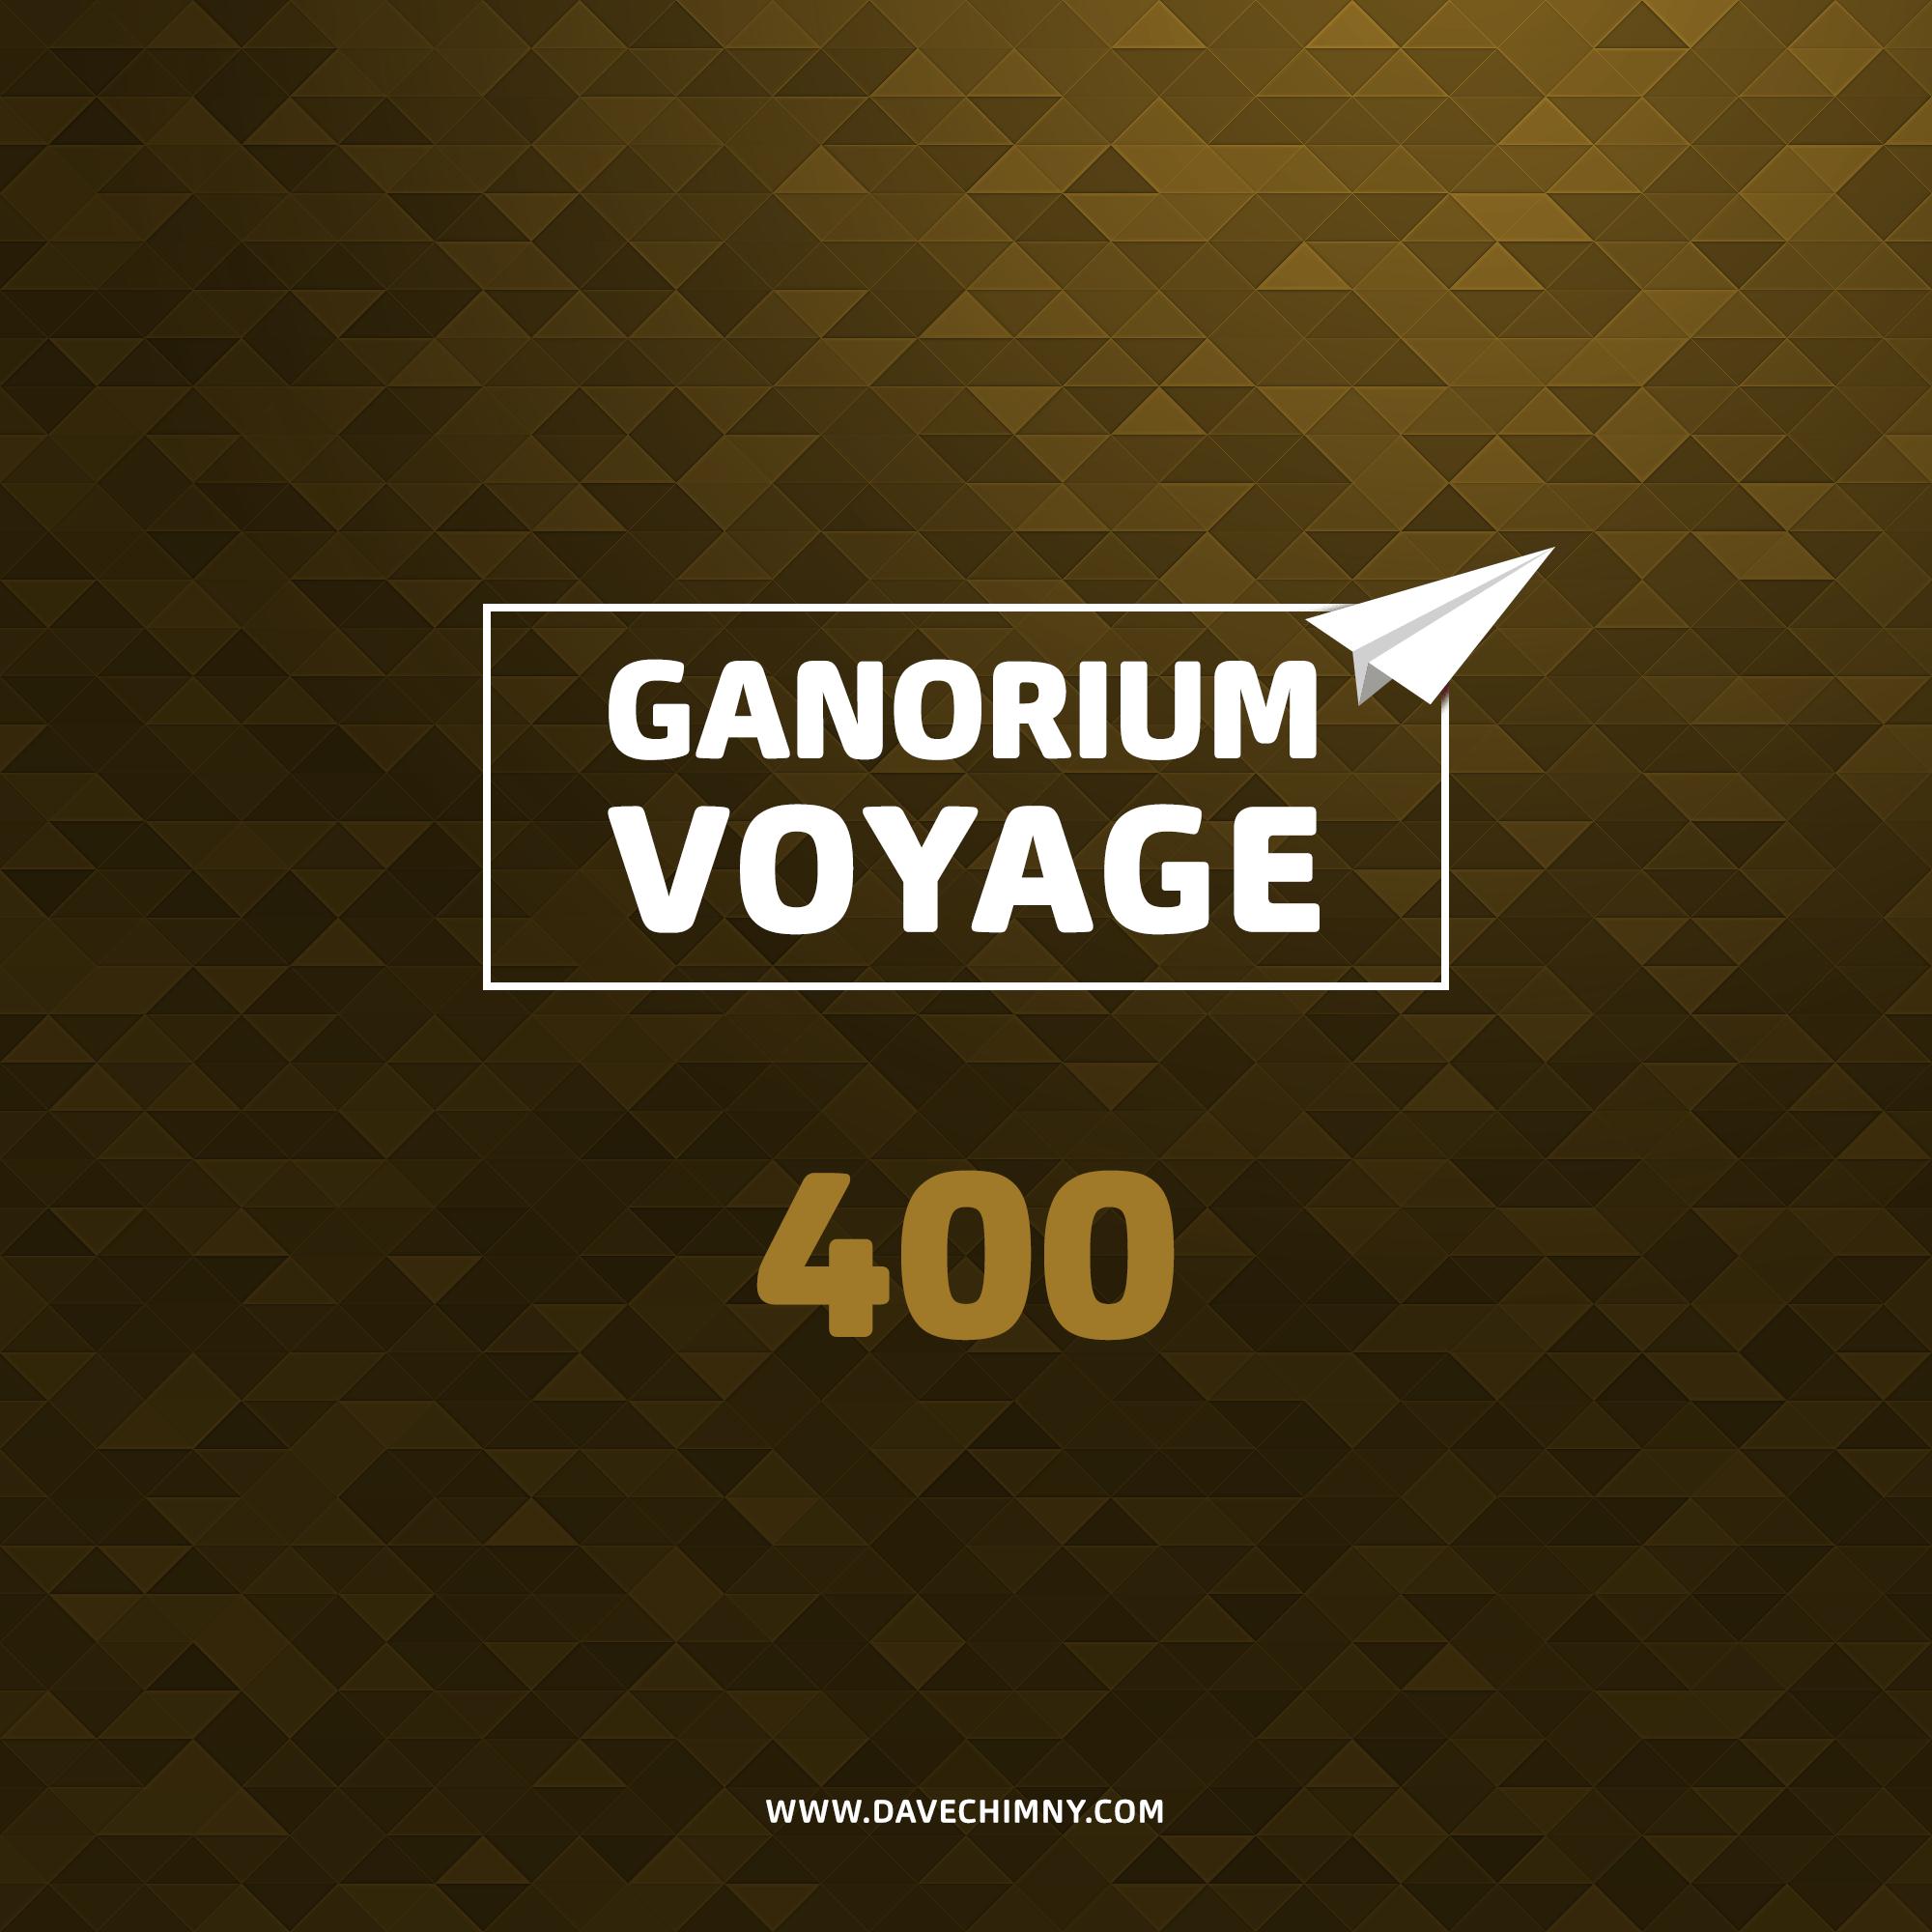 Dave Chimny - Ganorium Voyage 400